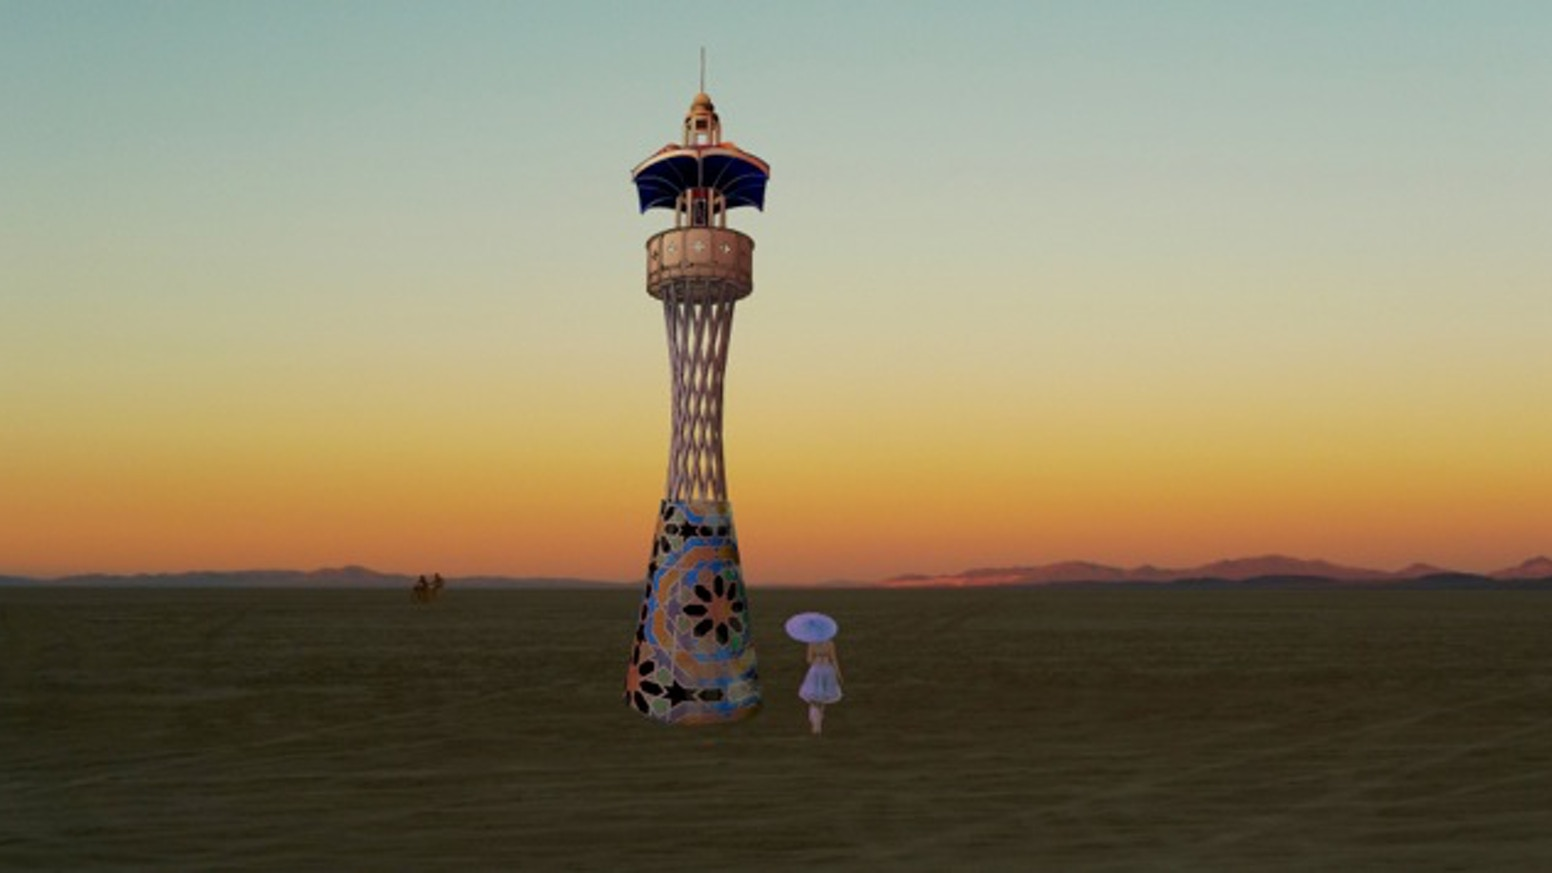 Cosmic Praise: A Burning Man Honorarium Art Project for 2014